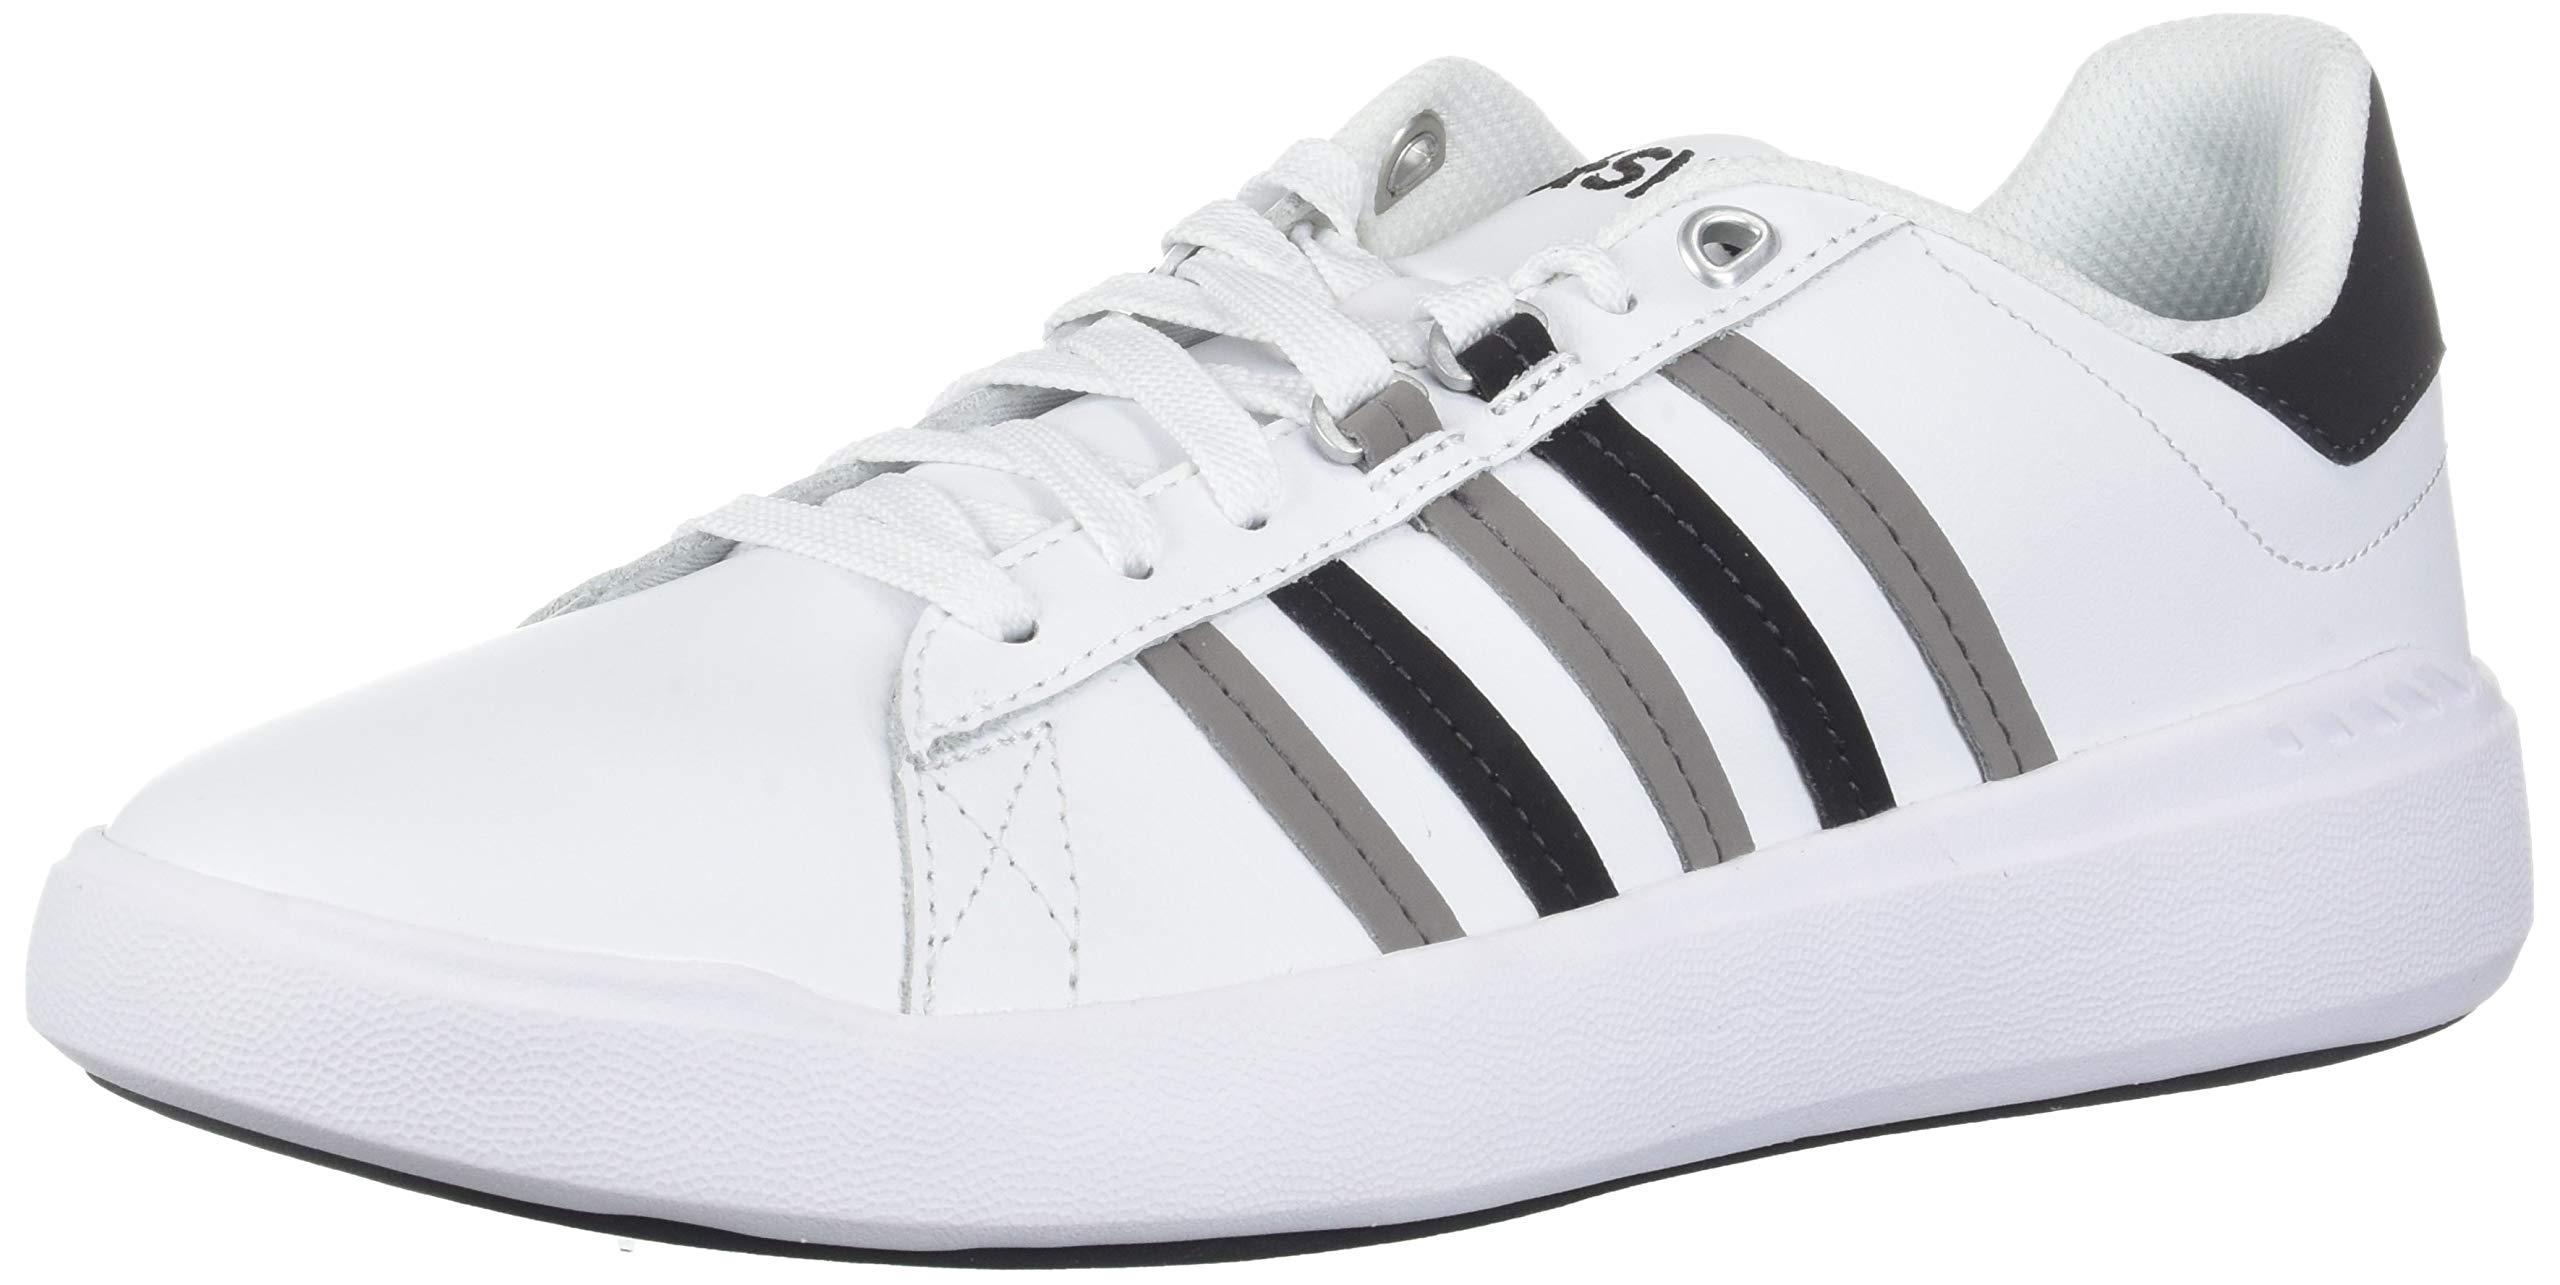 Pershing Court Light CMF Sneaker